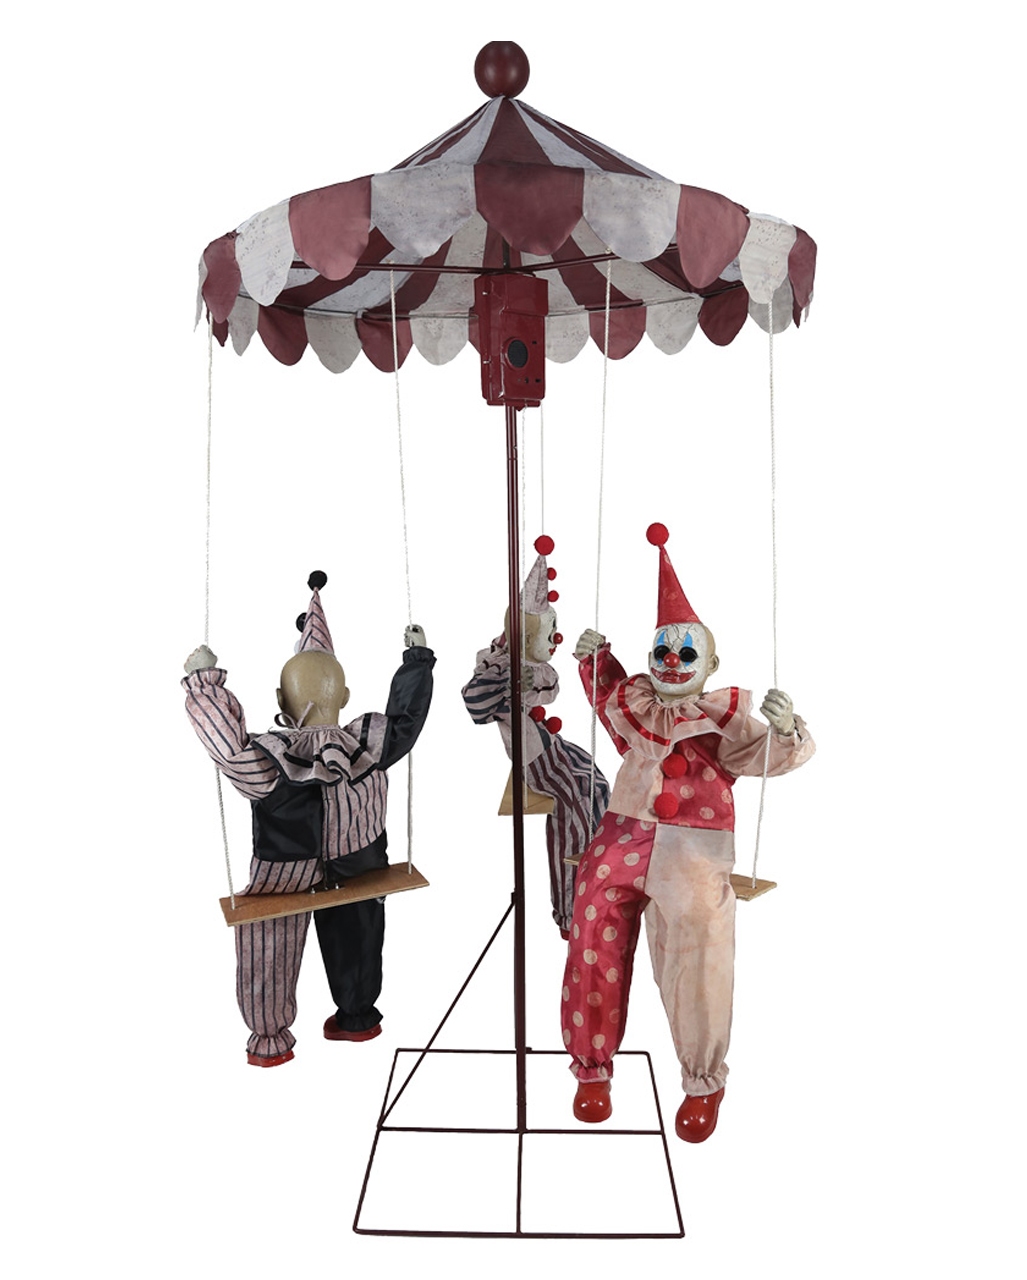 ec737910c56 Horrorclown Carousel Animatronic Buy HERE